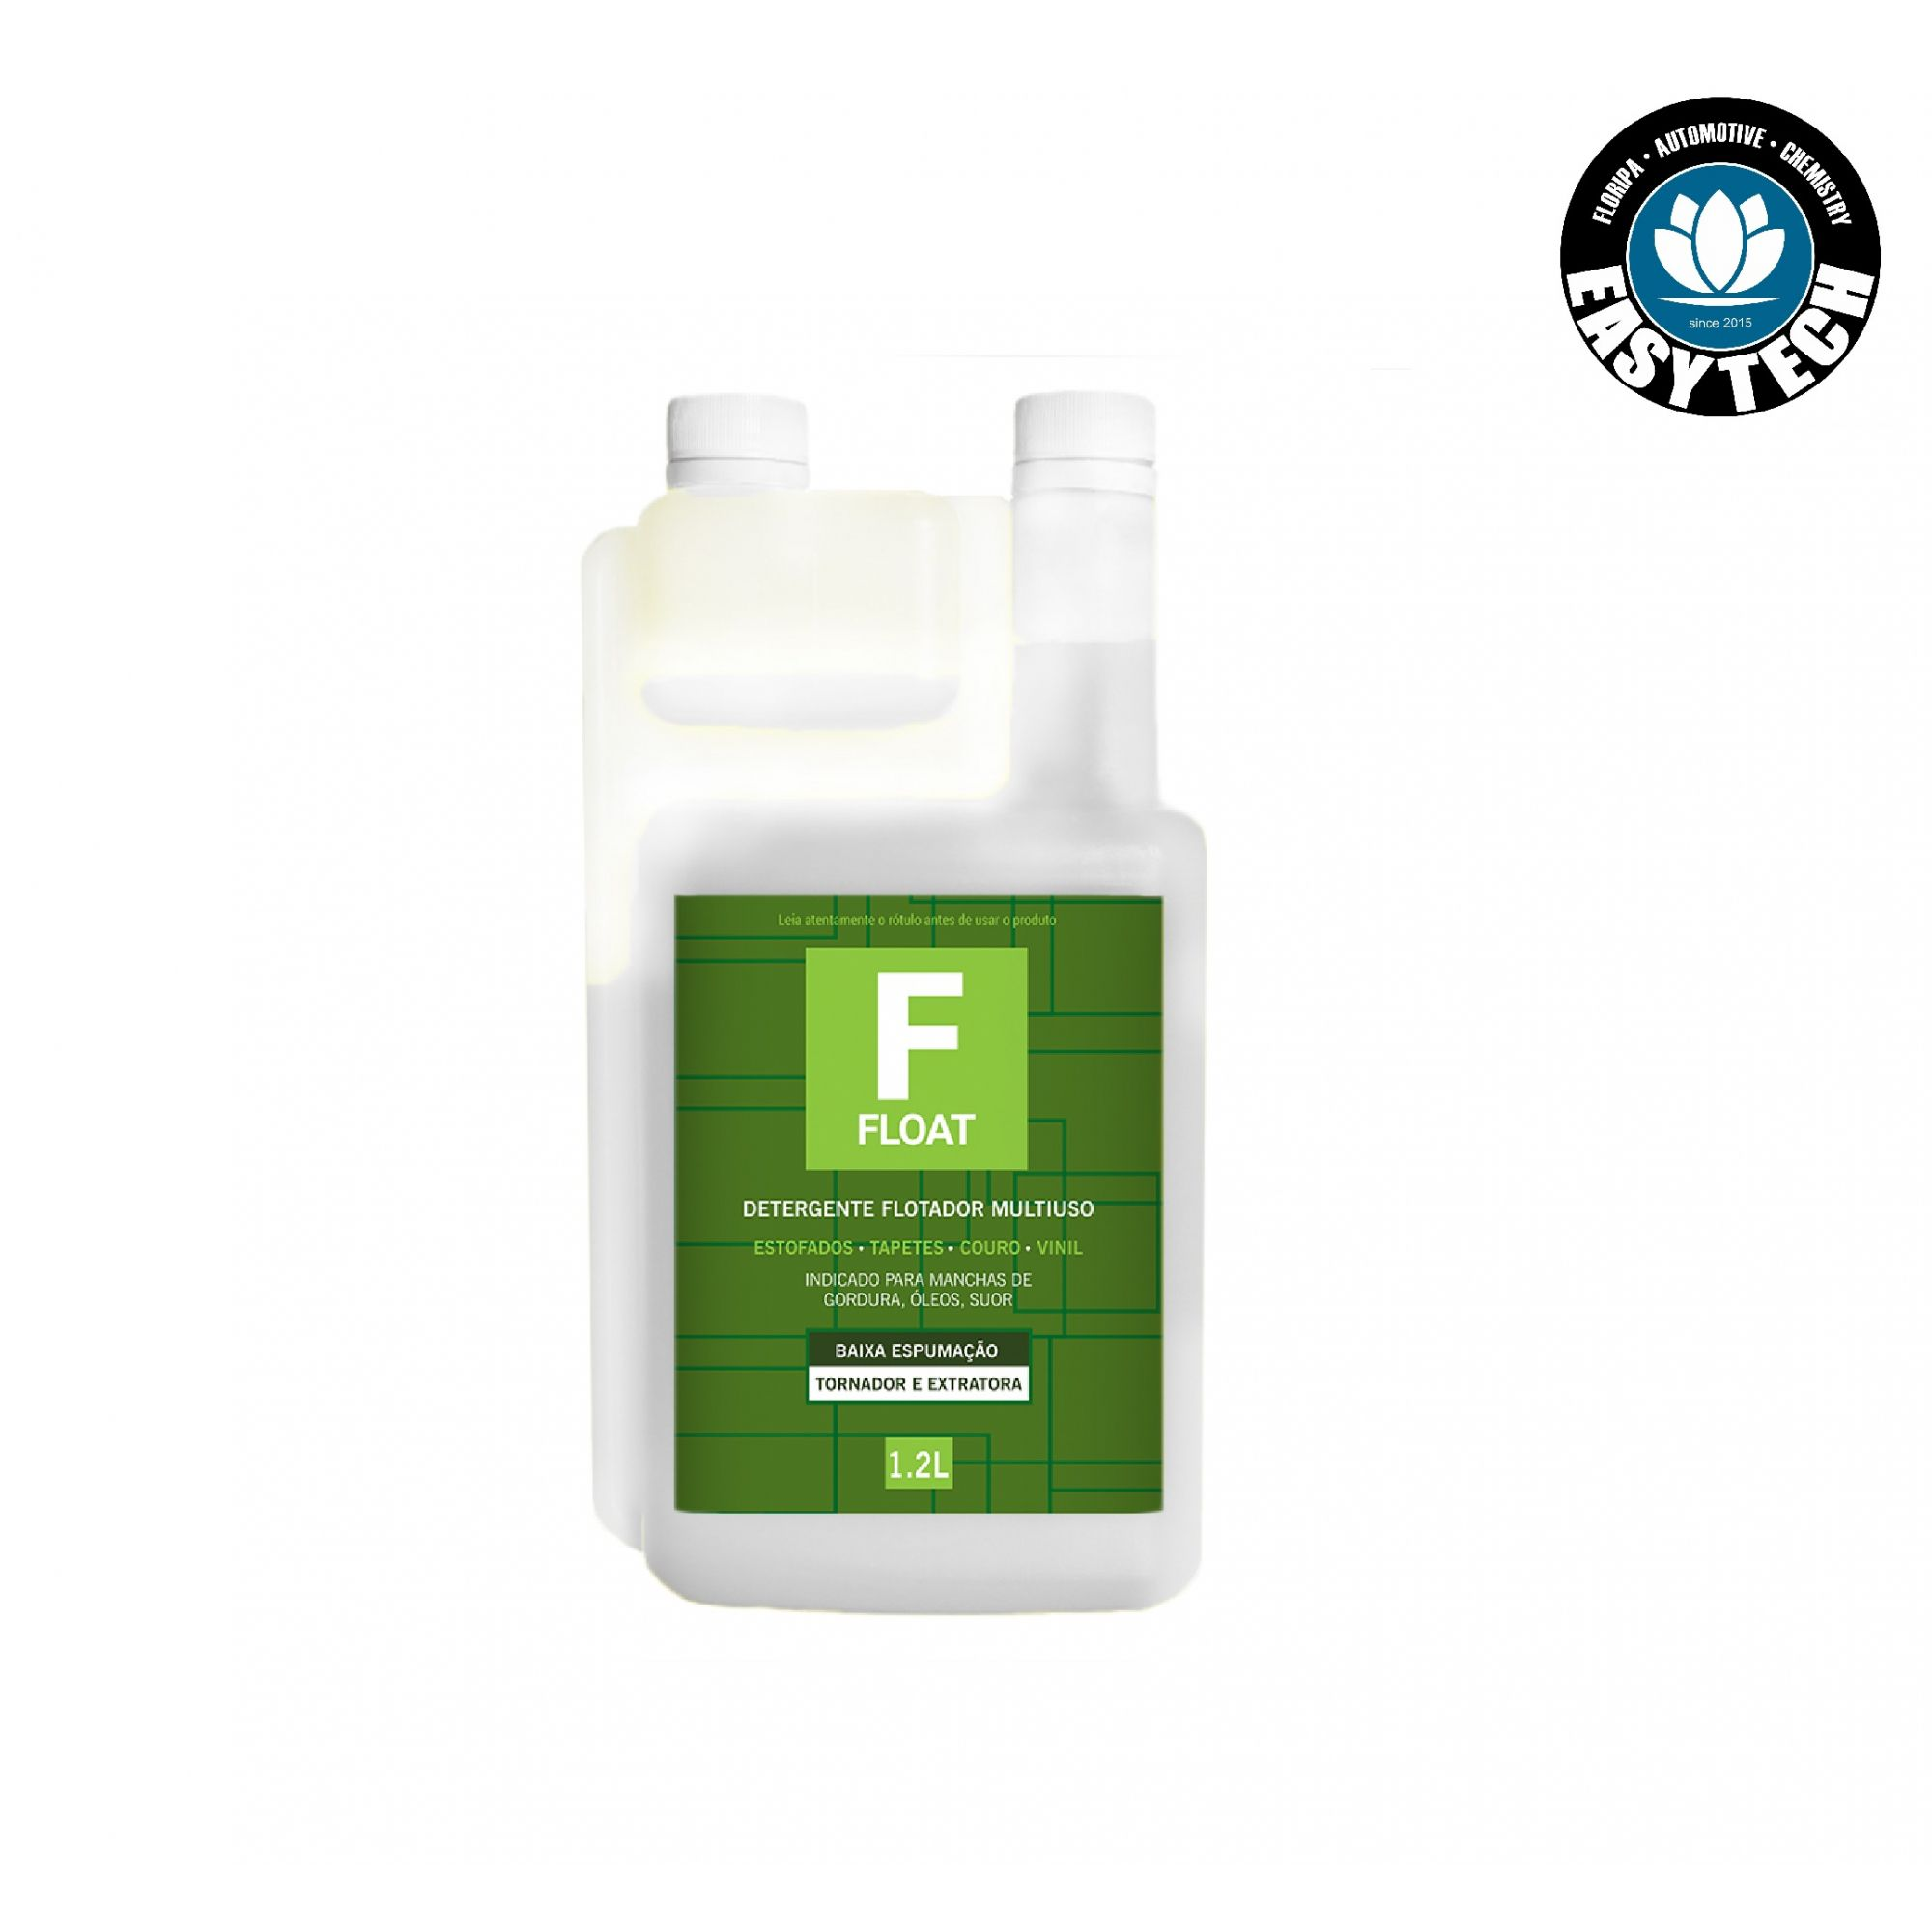 Shampoo Melon 1,2l  + Pluri Apc 1,2l + Float 1,2L Easytech